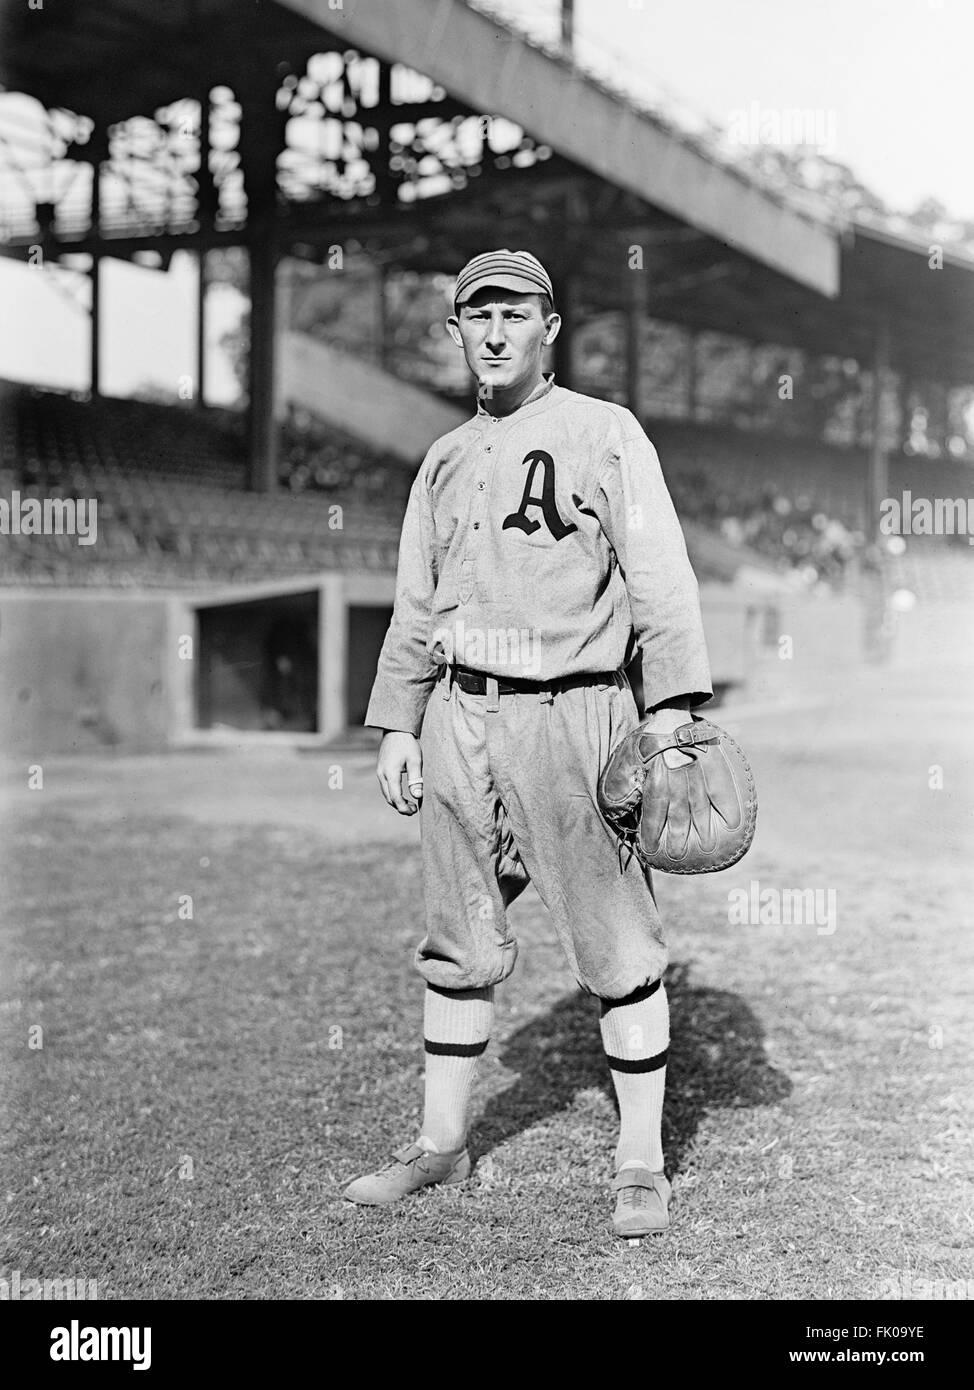 Jack Lapp, Major League Baseball Player, Philadelphia Athletics, Portrait, circa 1914.jpg - Stock Image